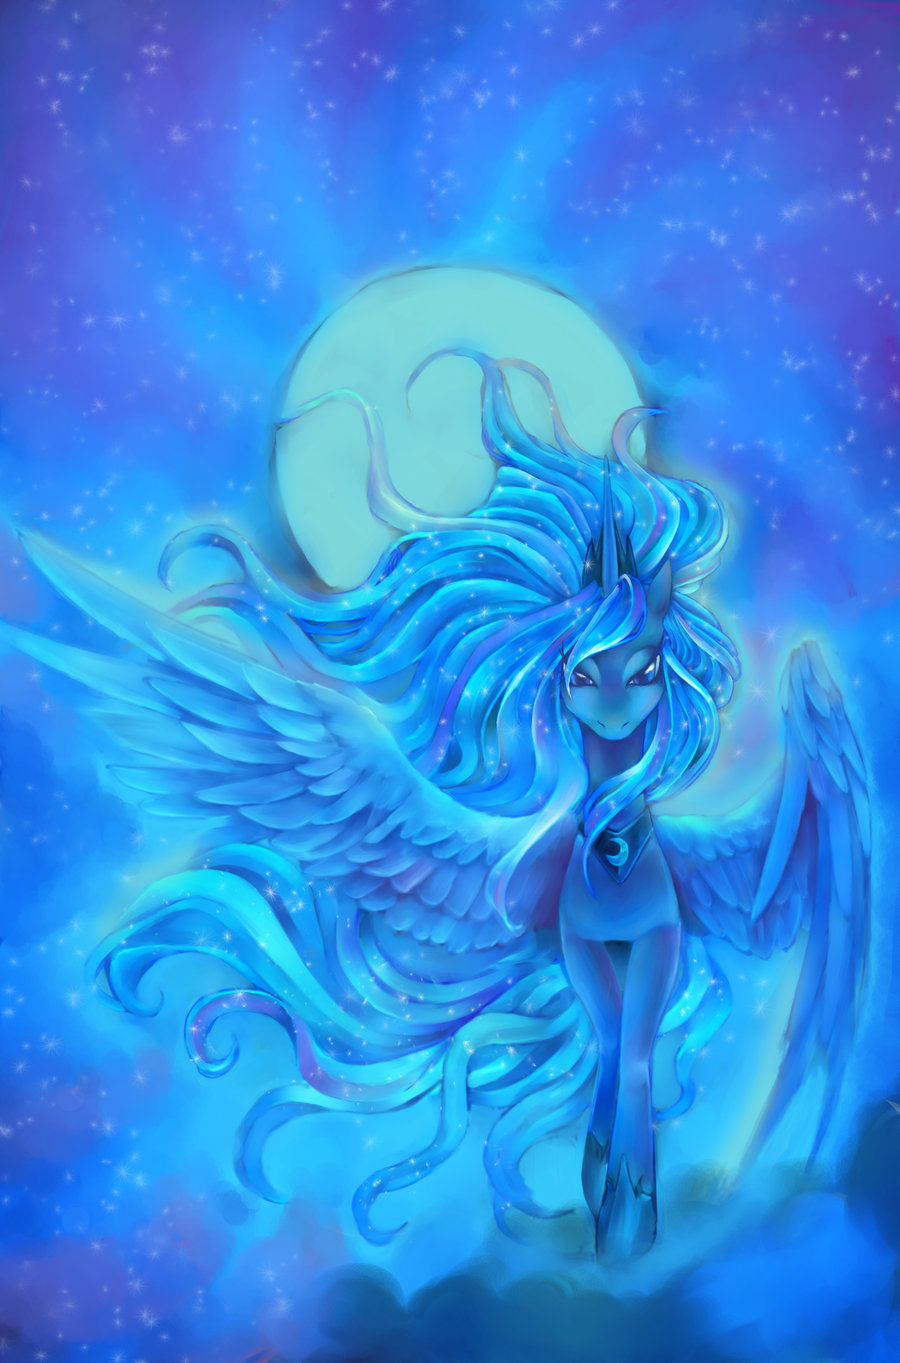 Princess Luna - My Lit...